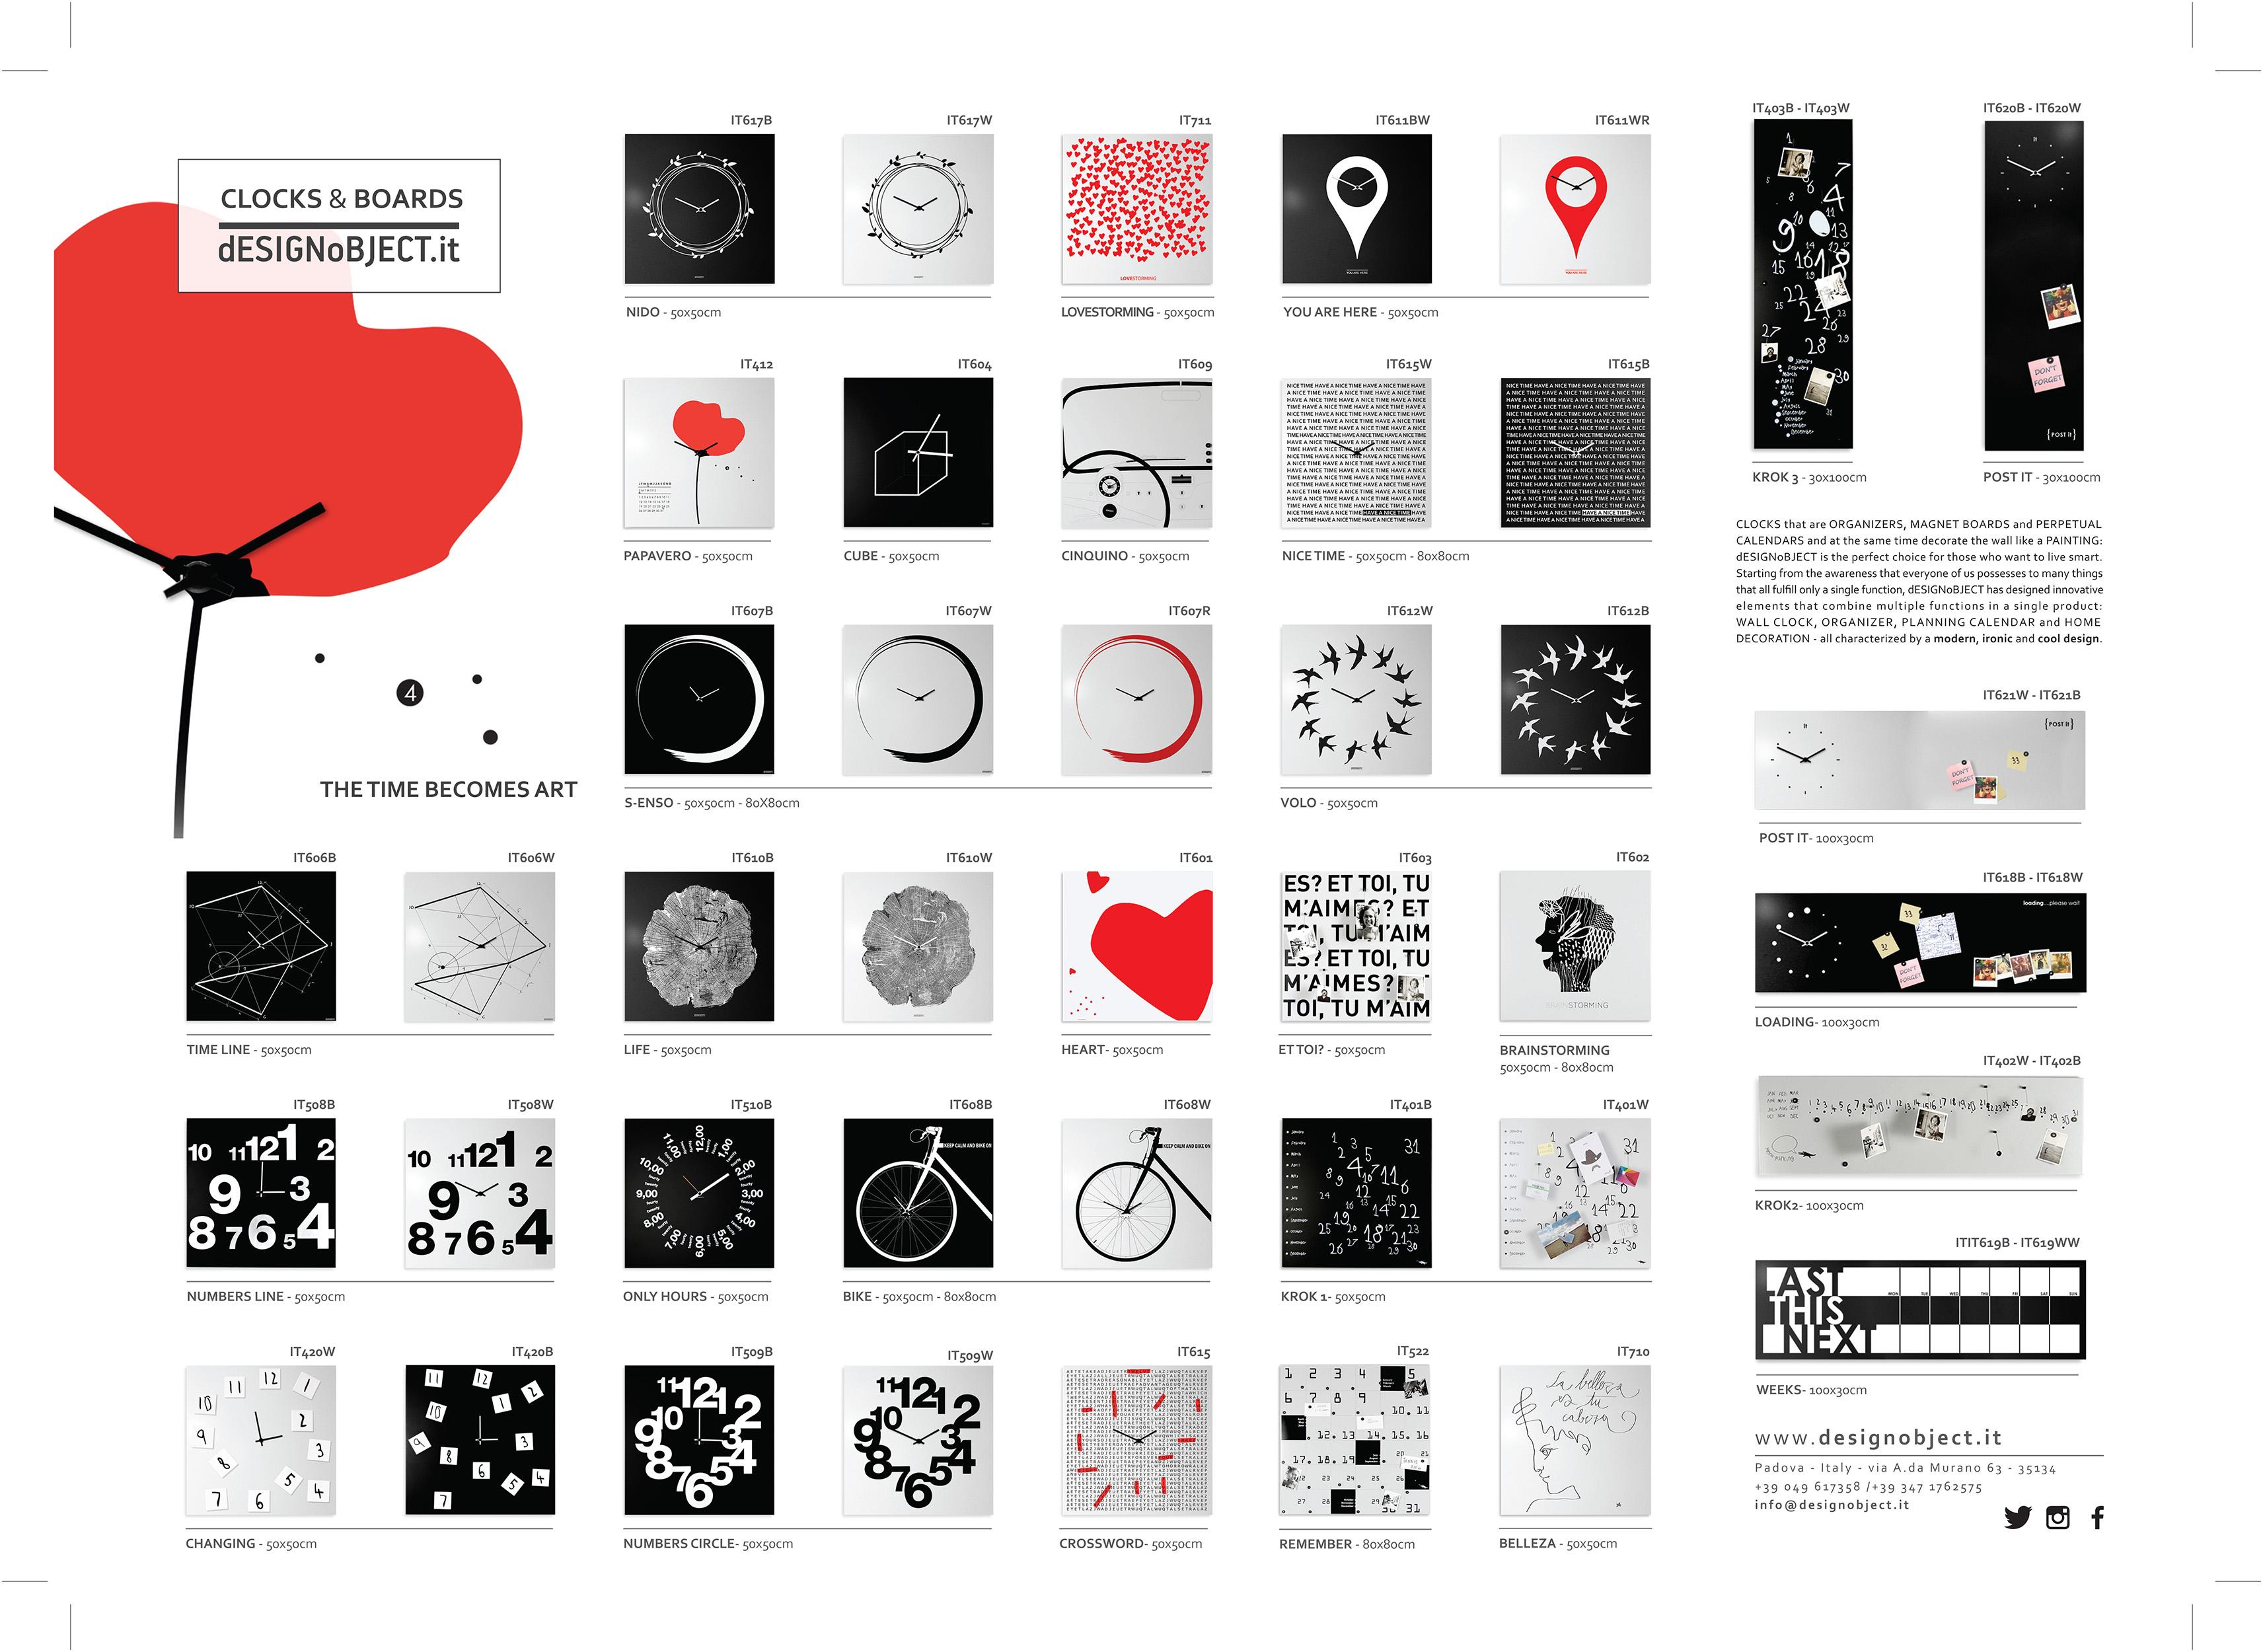 Clock Design - Magnetic Boards - designobject